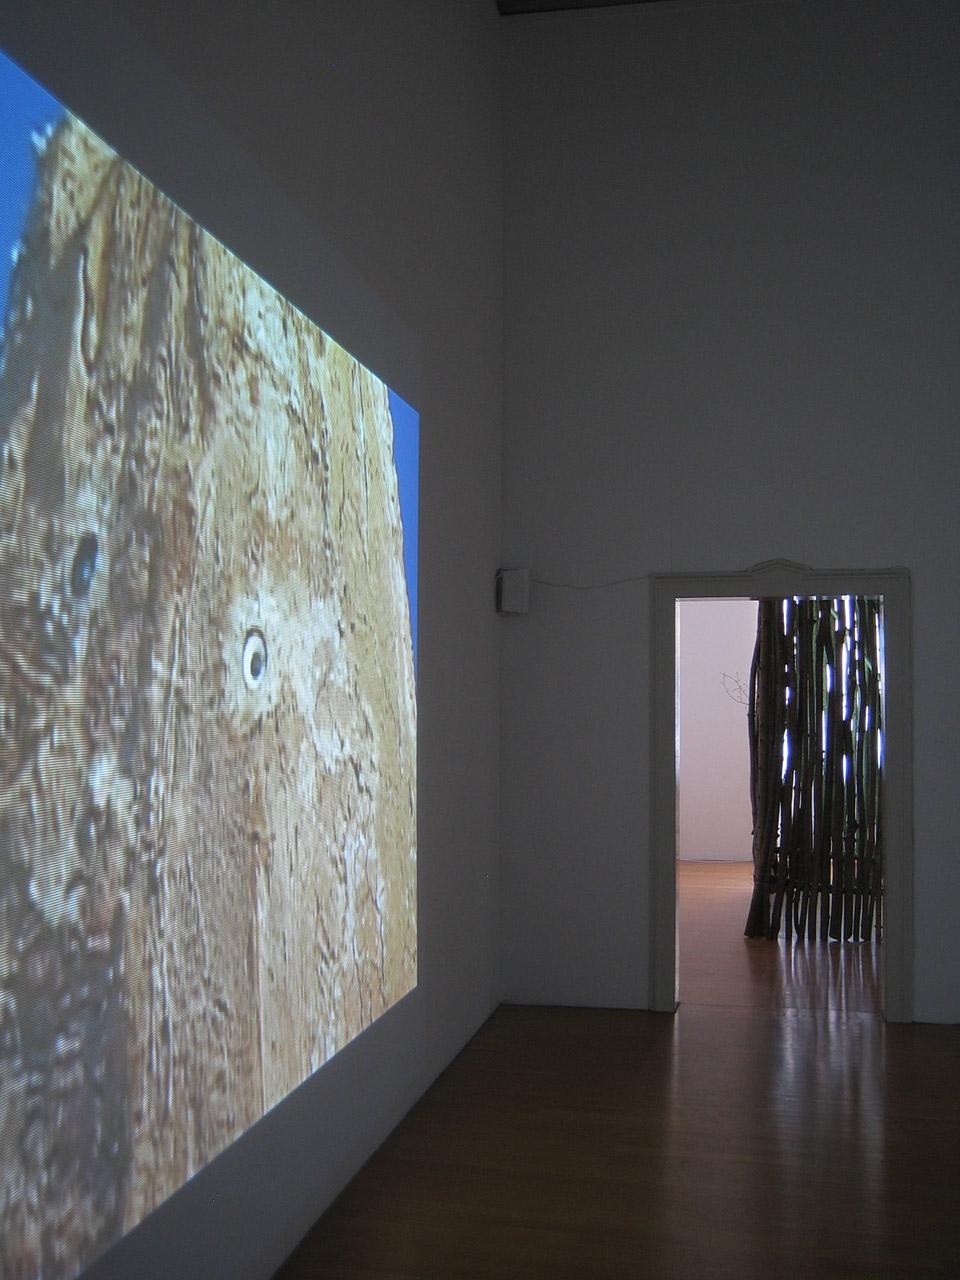 Wael-Shawky-Kunsthalle-Winterthur-2007-1.jpg